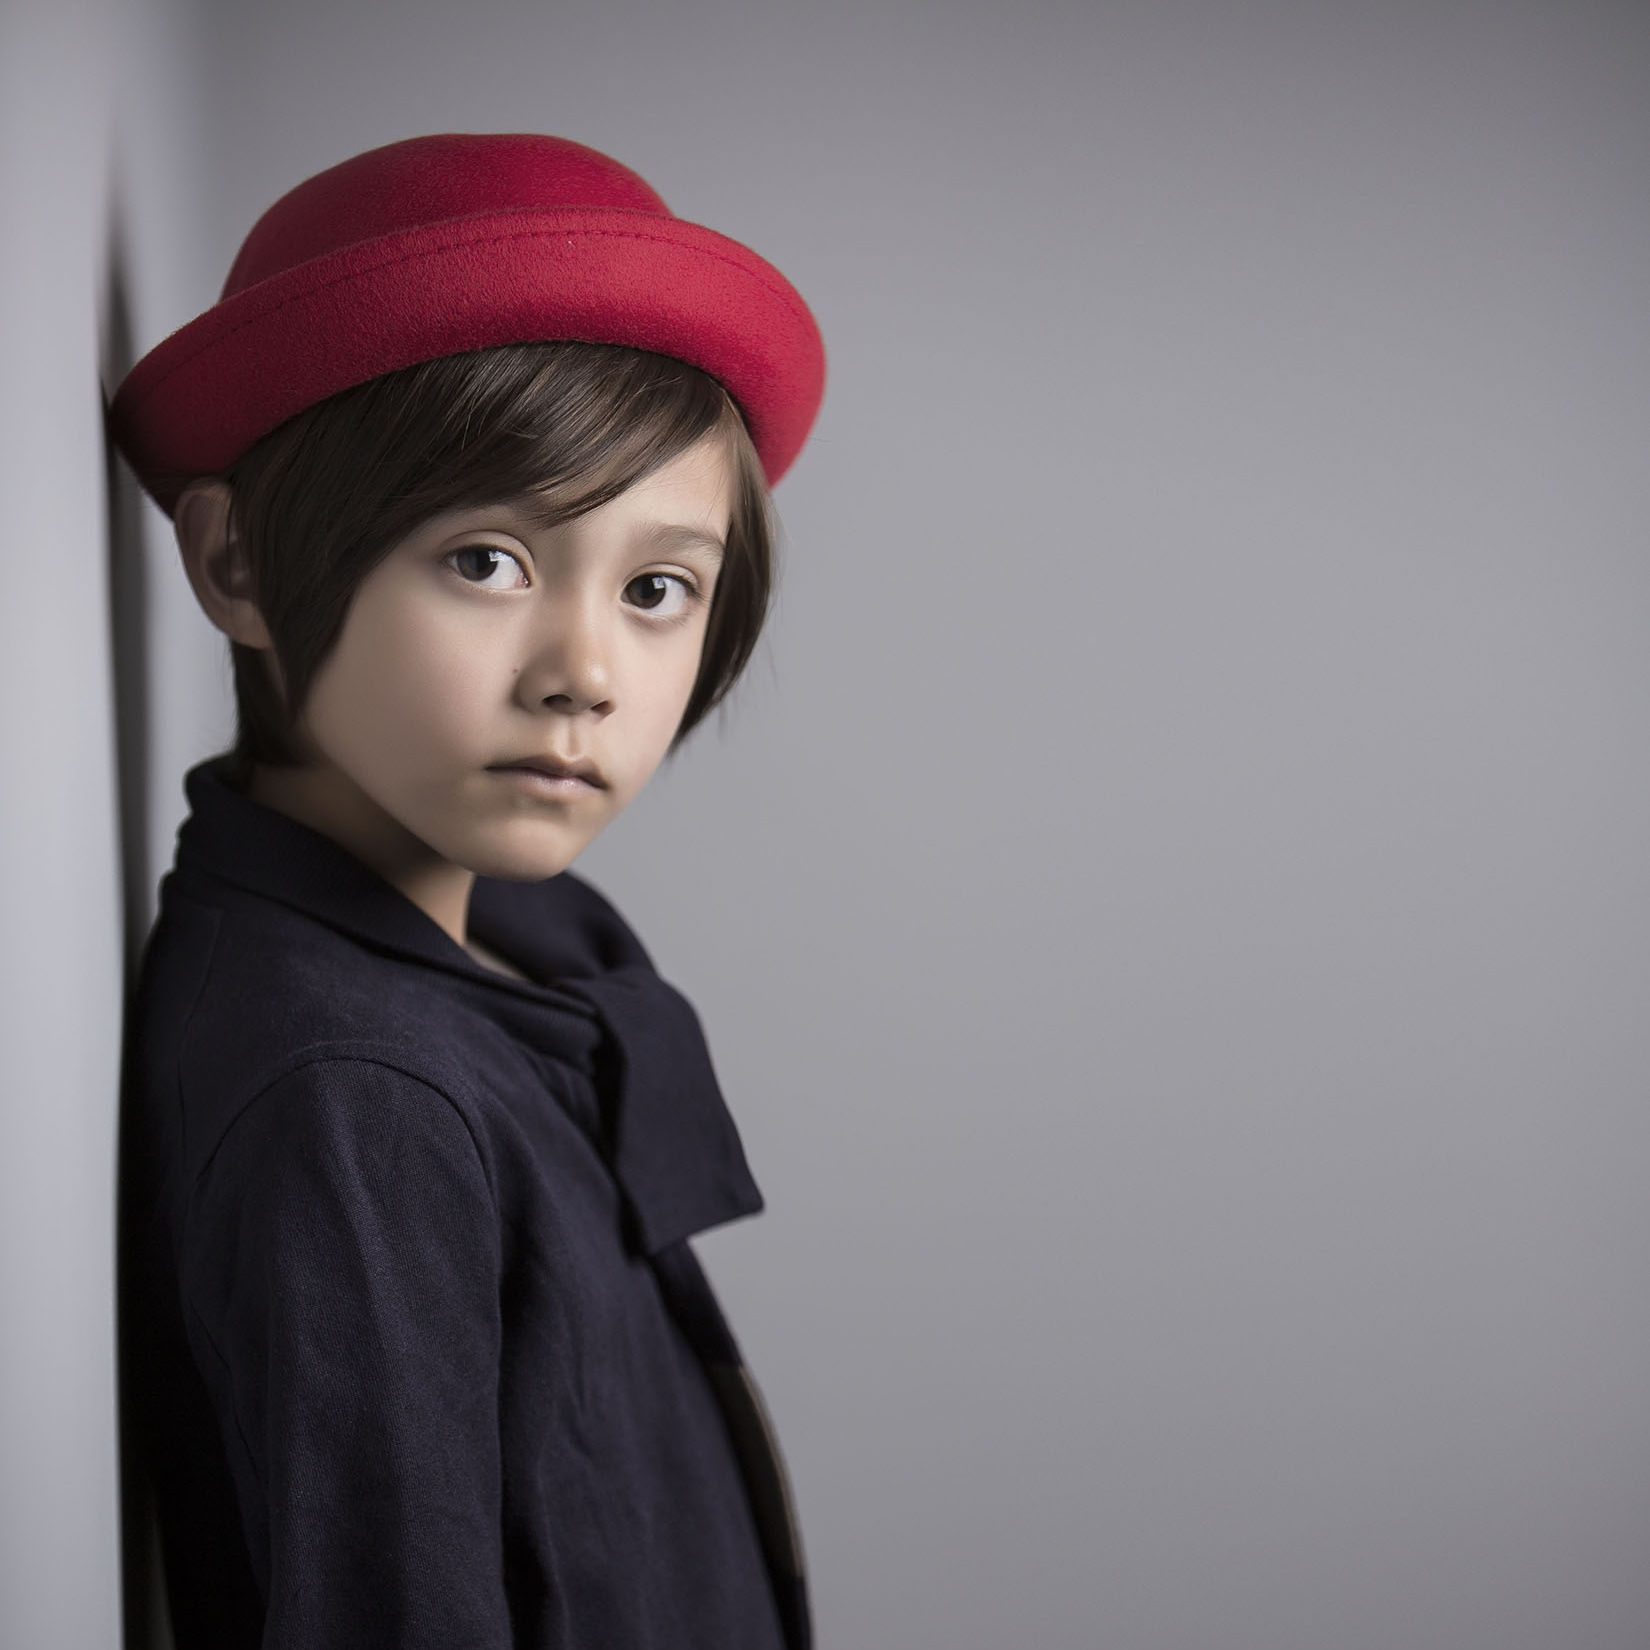 elizabethgphotography_kingslangley_hertfordshire_fineart_childrens_photography_05.jpg